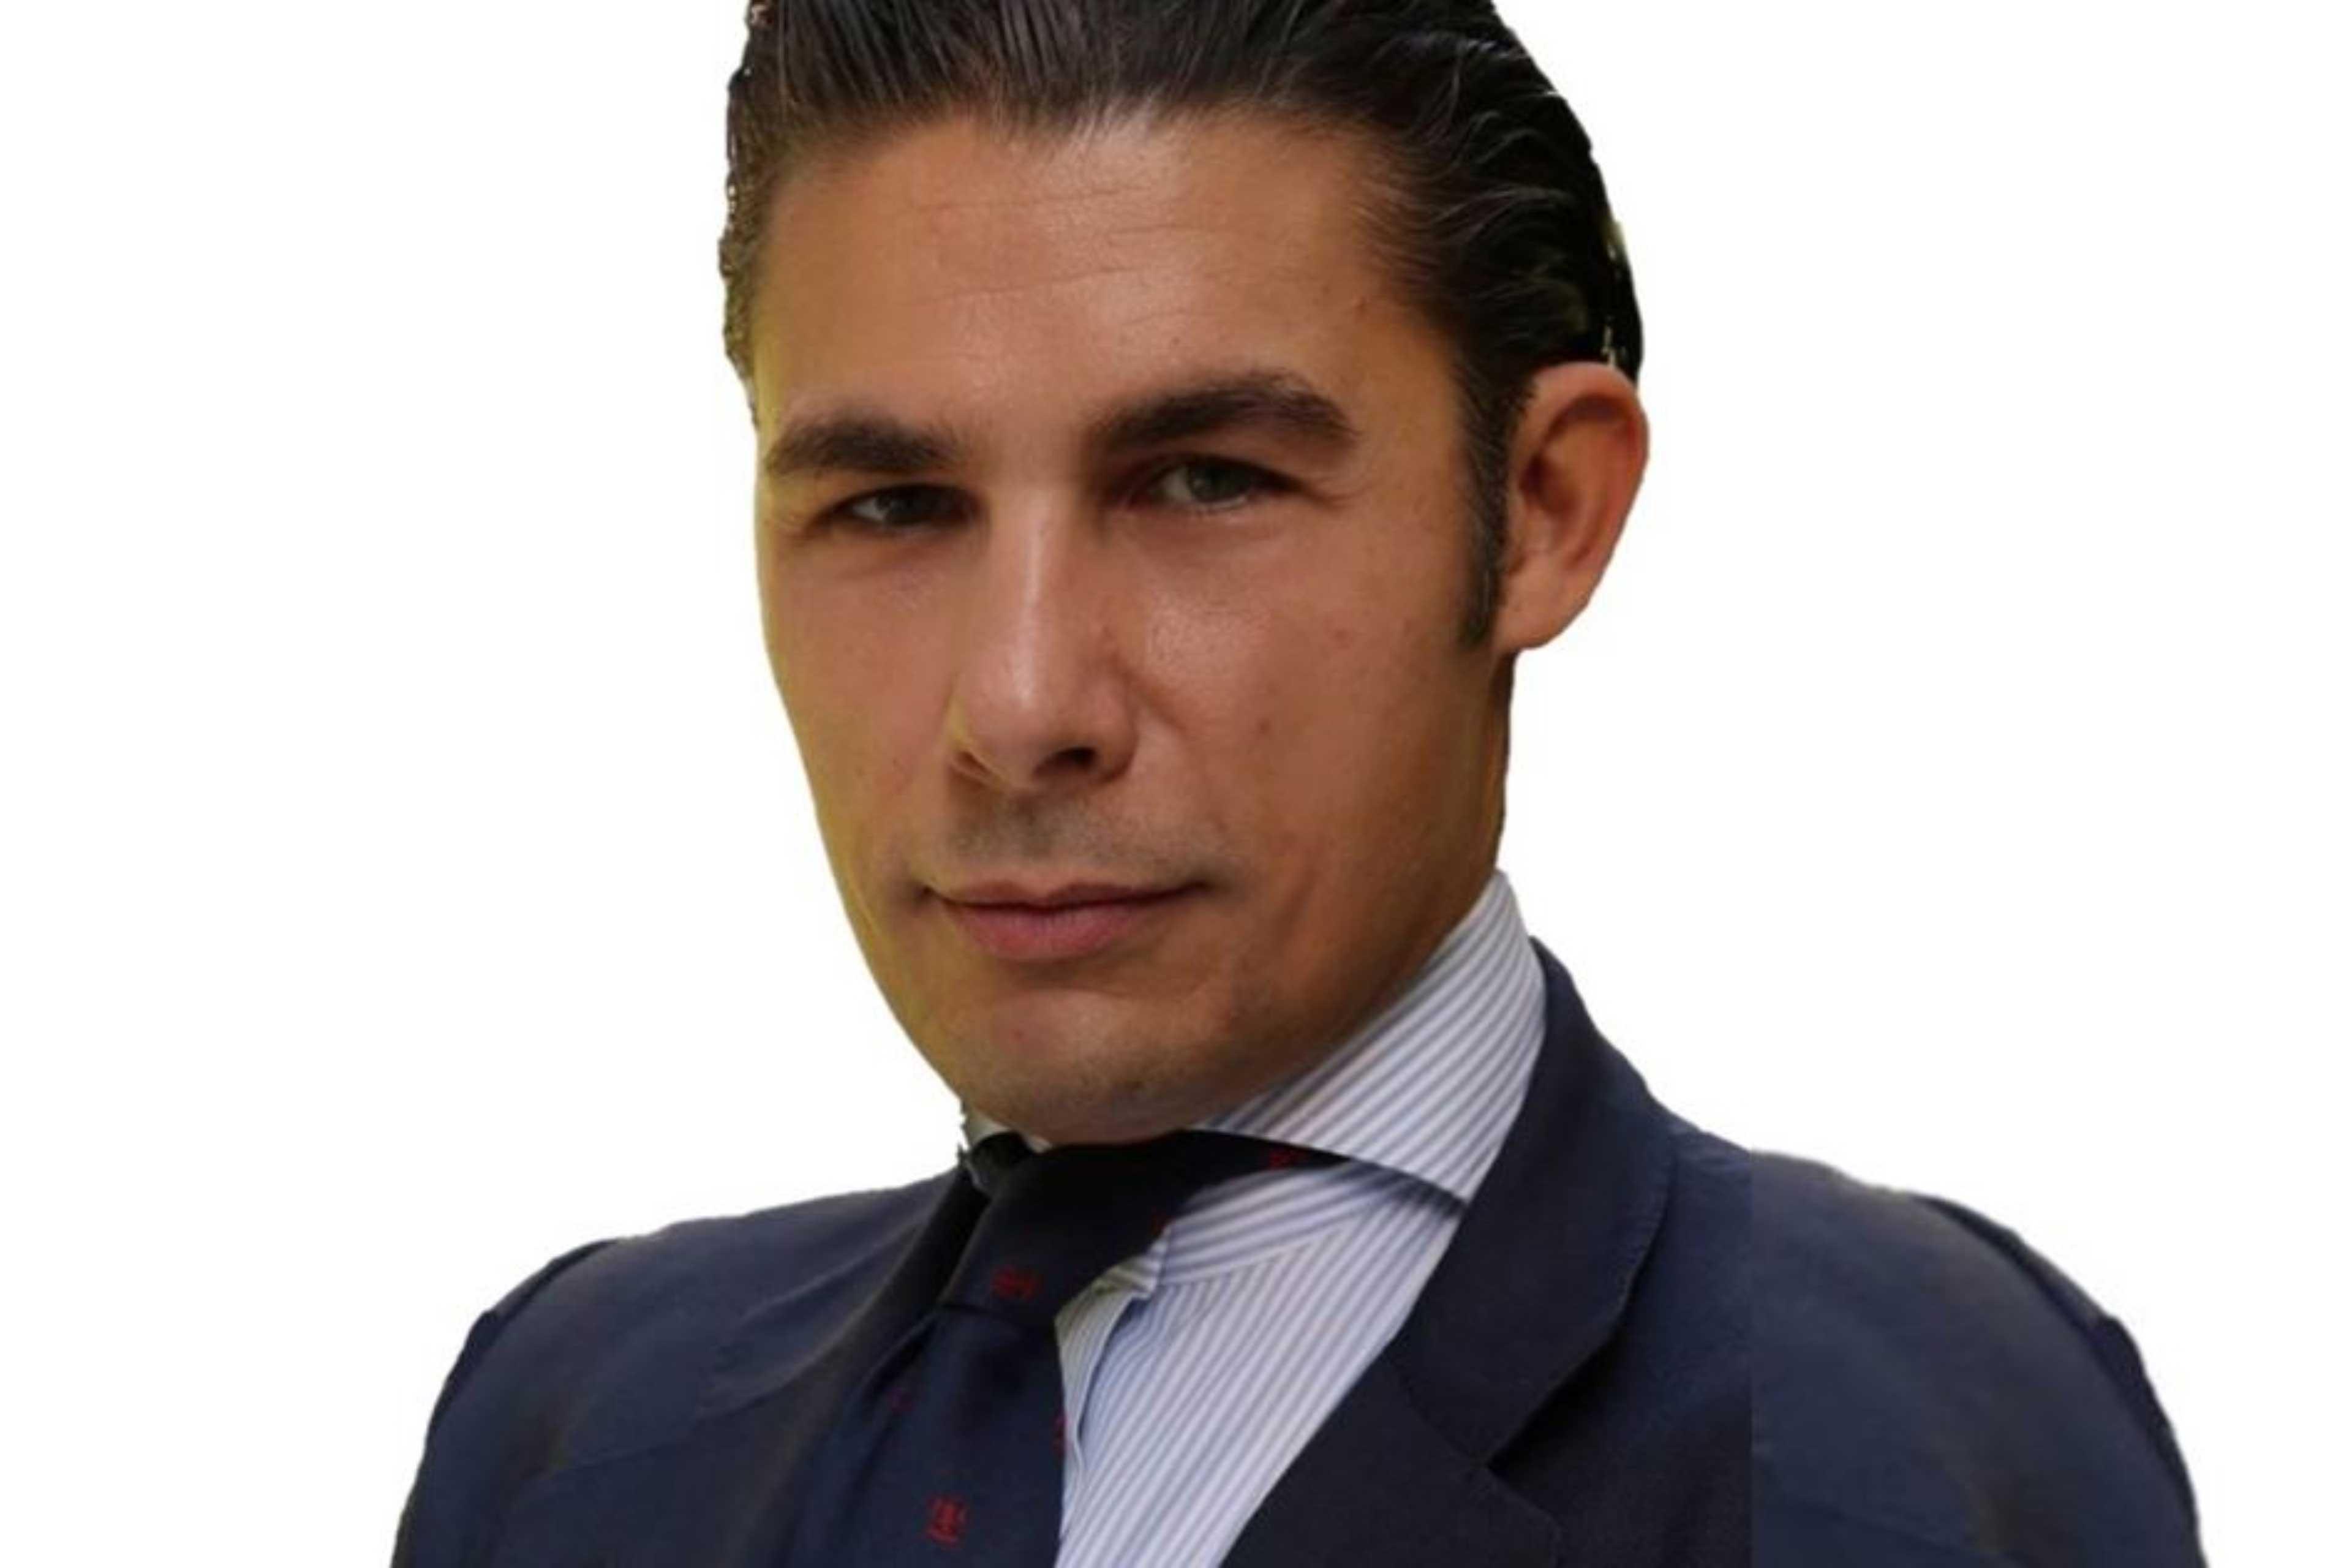 Enrique Baranda